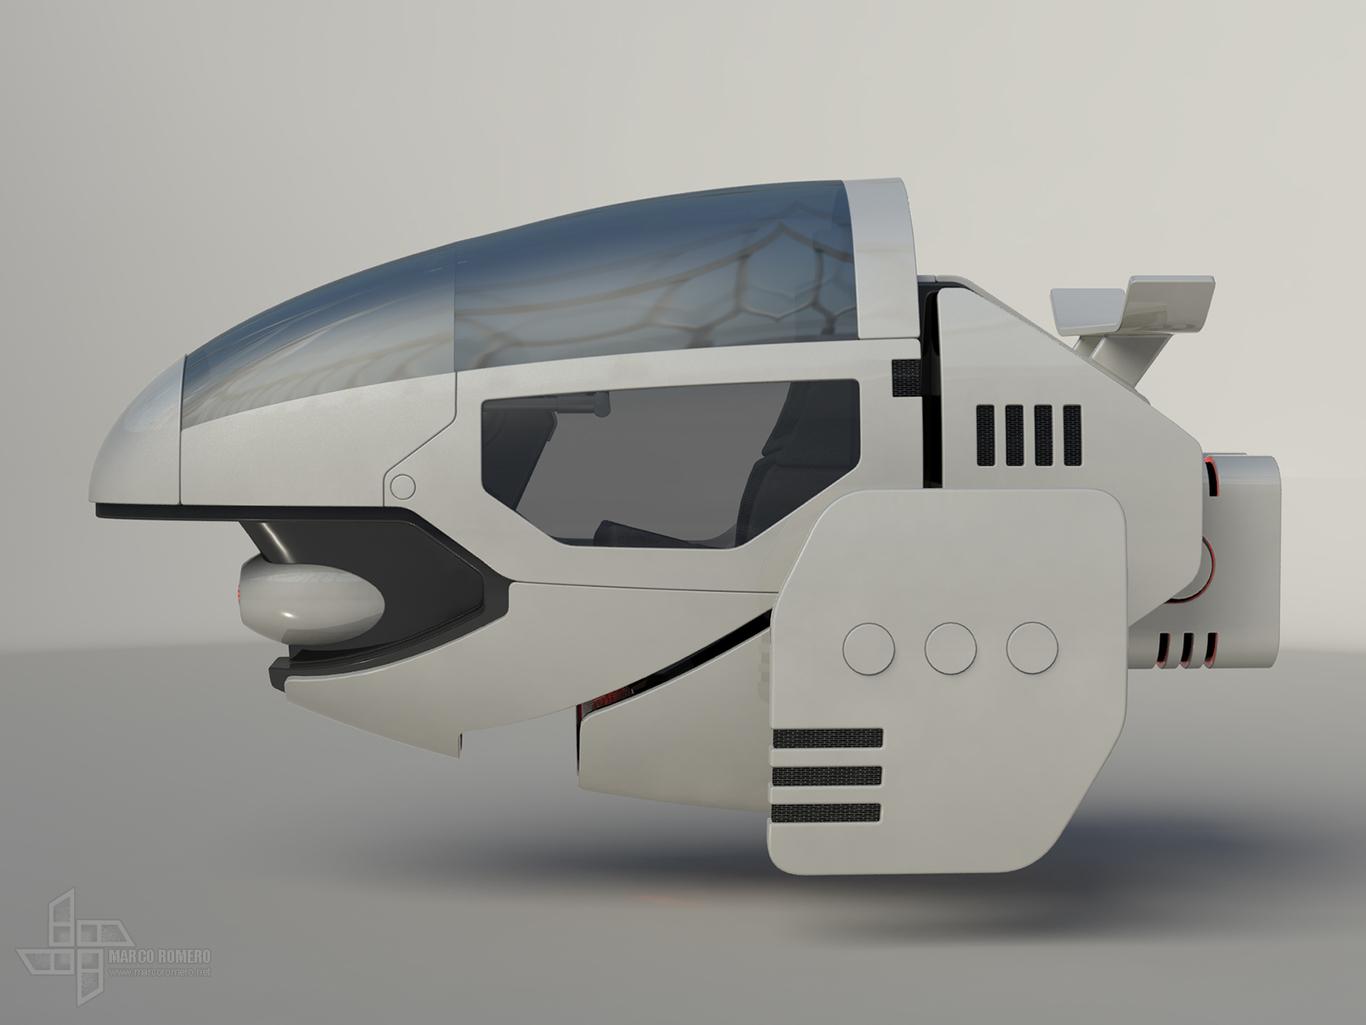 Maromero skybike 1 8074bc5f m1nr